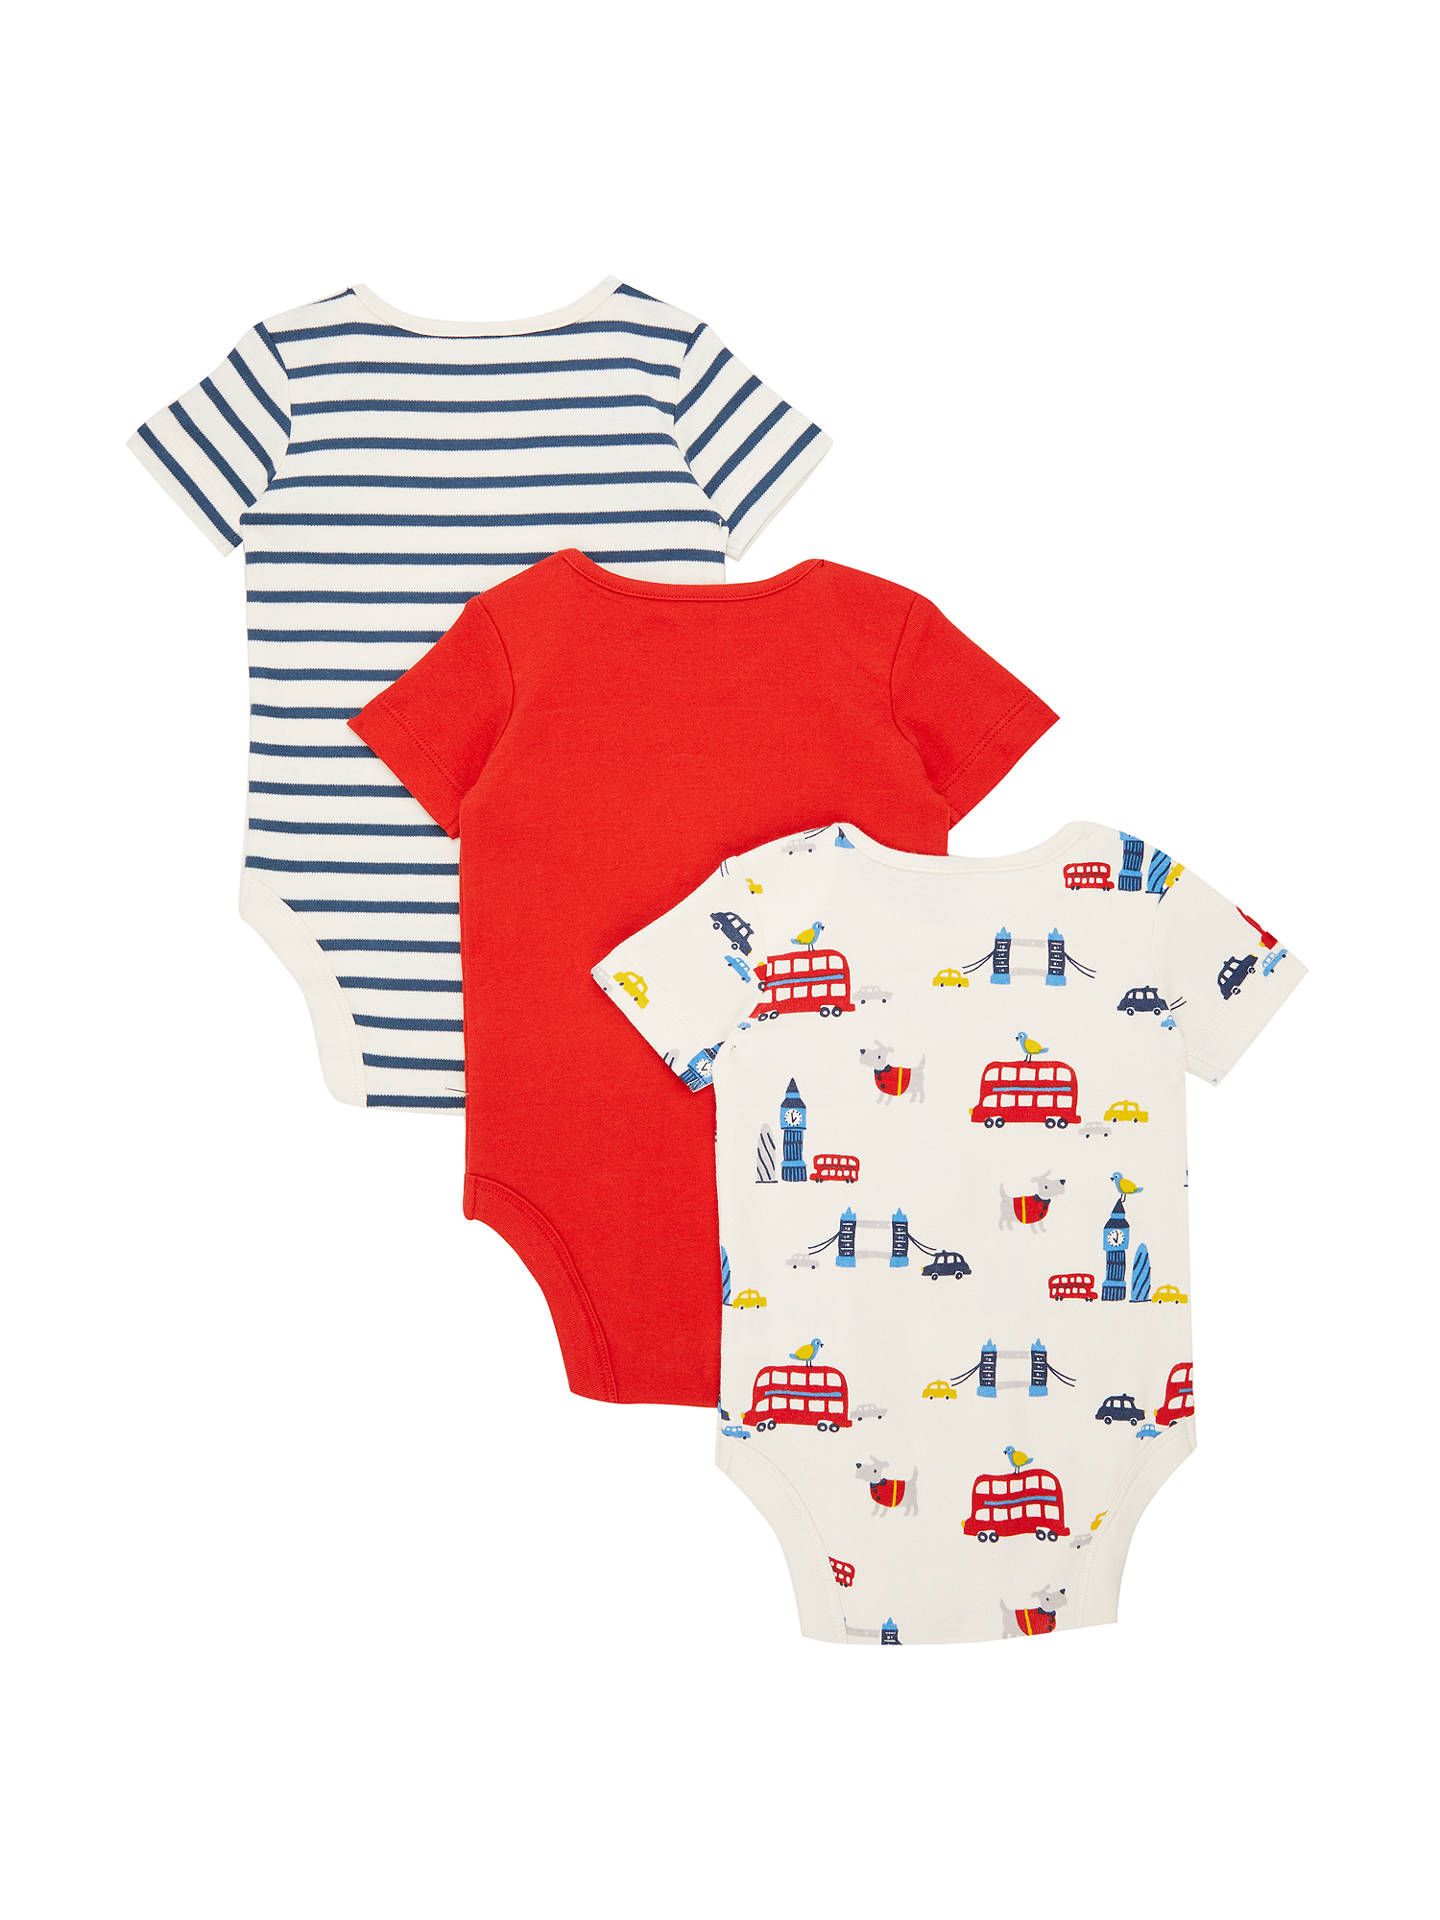 bdde8dc27901 John Lewis   Partners Baby GOTS Organic Cotton Short Sleeve London ...